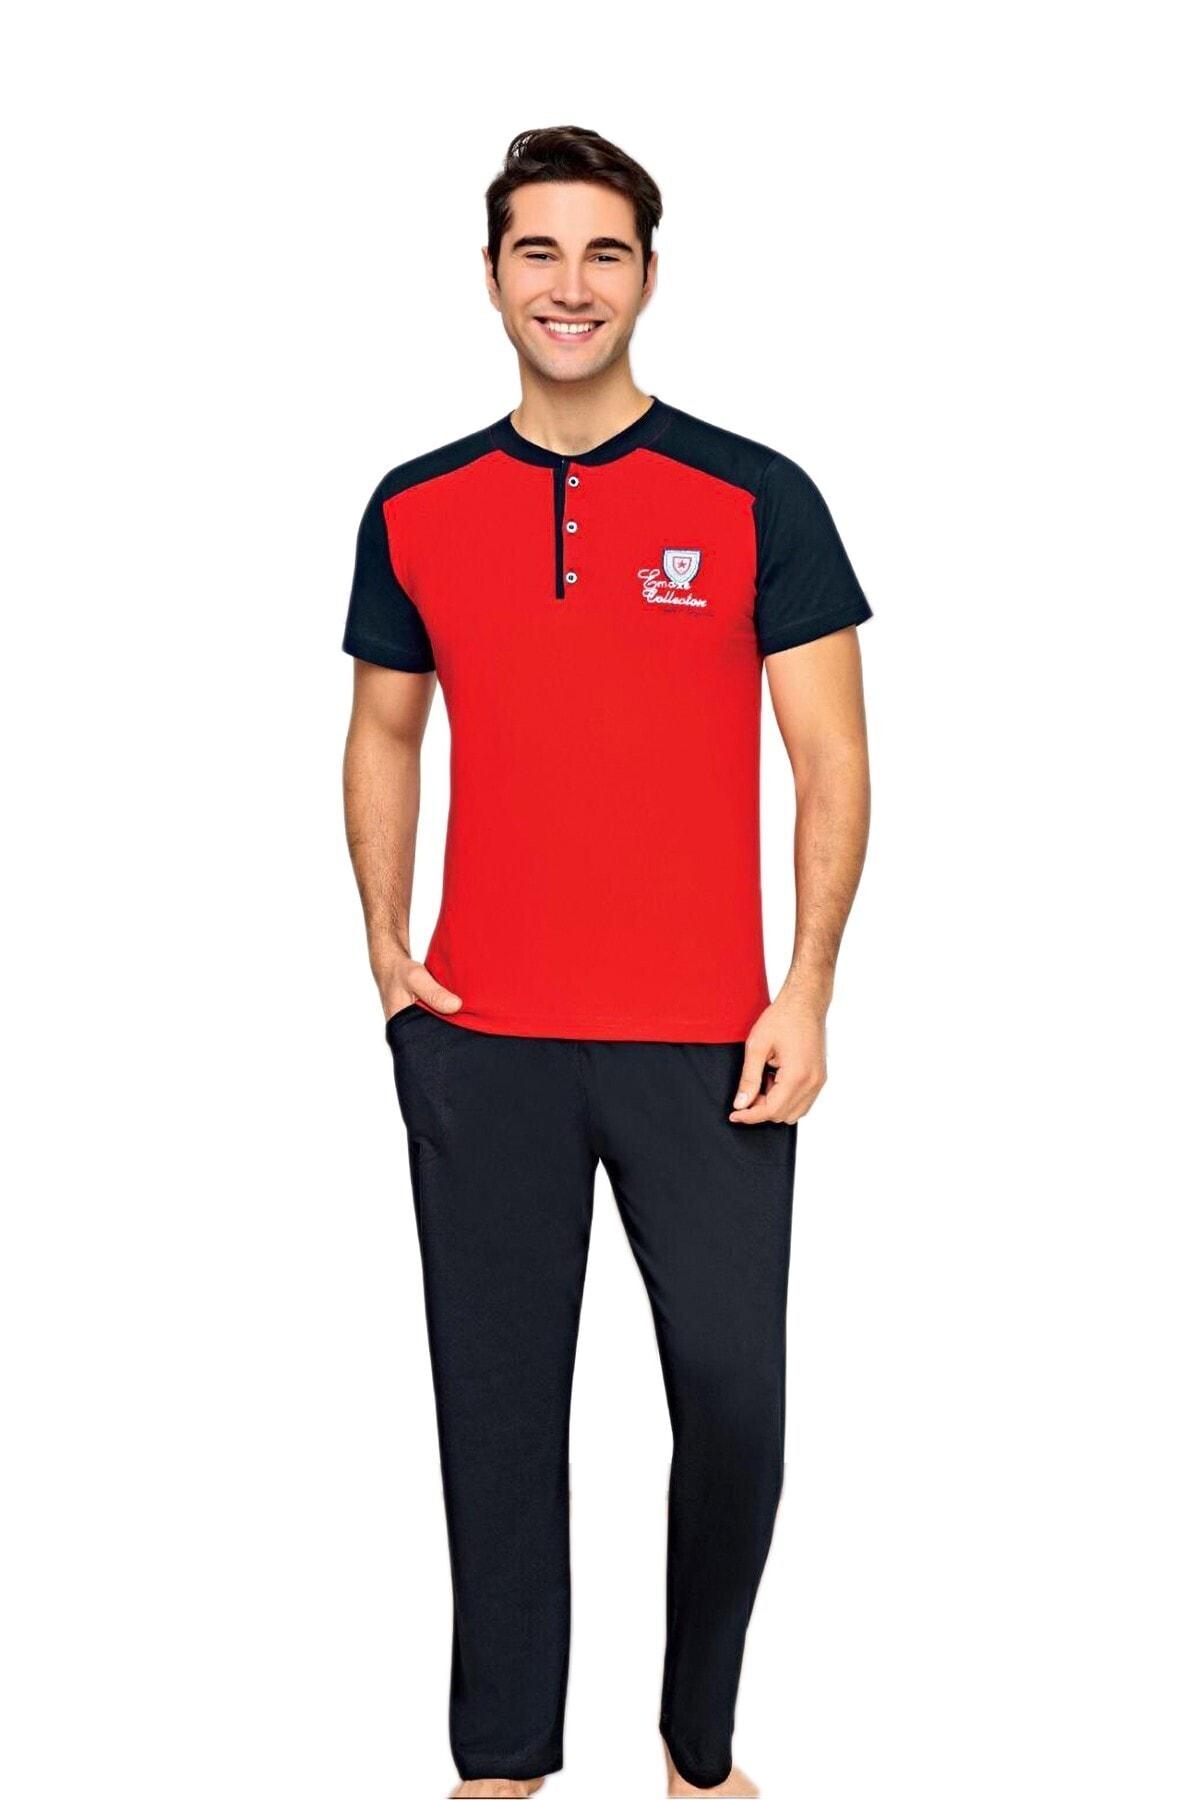 Colt Kırmızı/lacivert Pijama Takımı